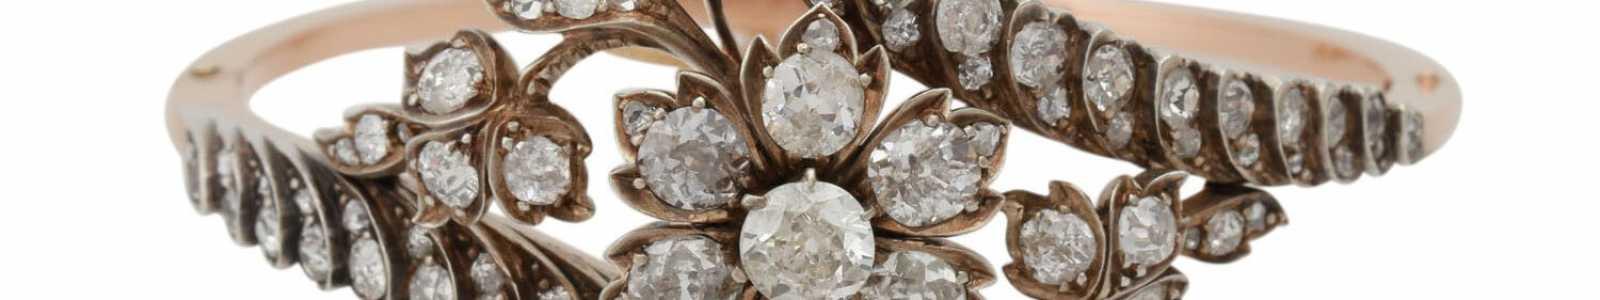 Art, antiques, jewelry, design